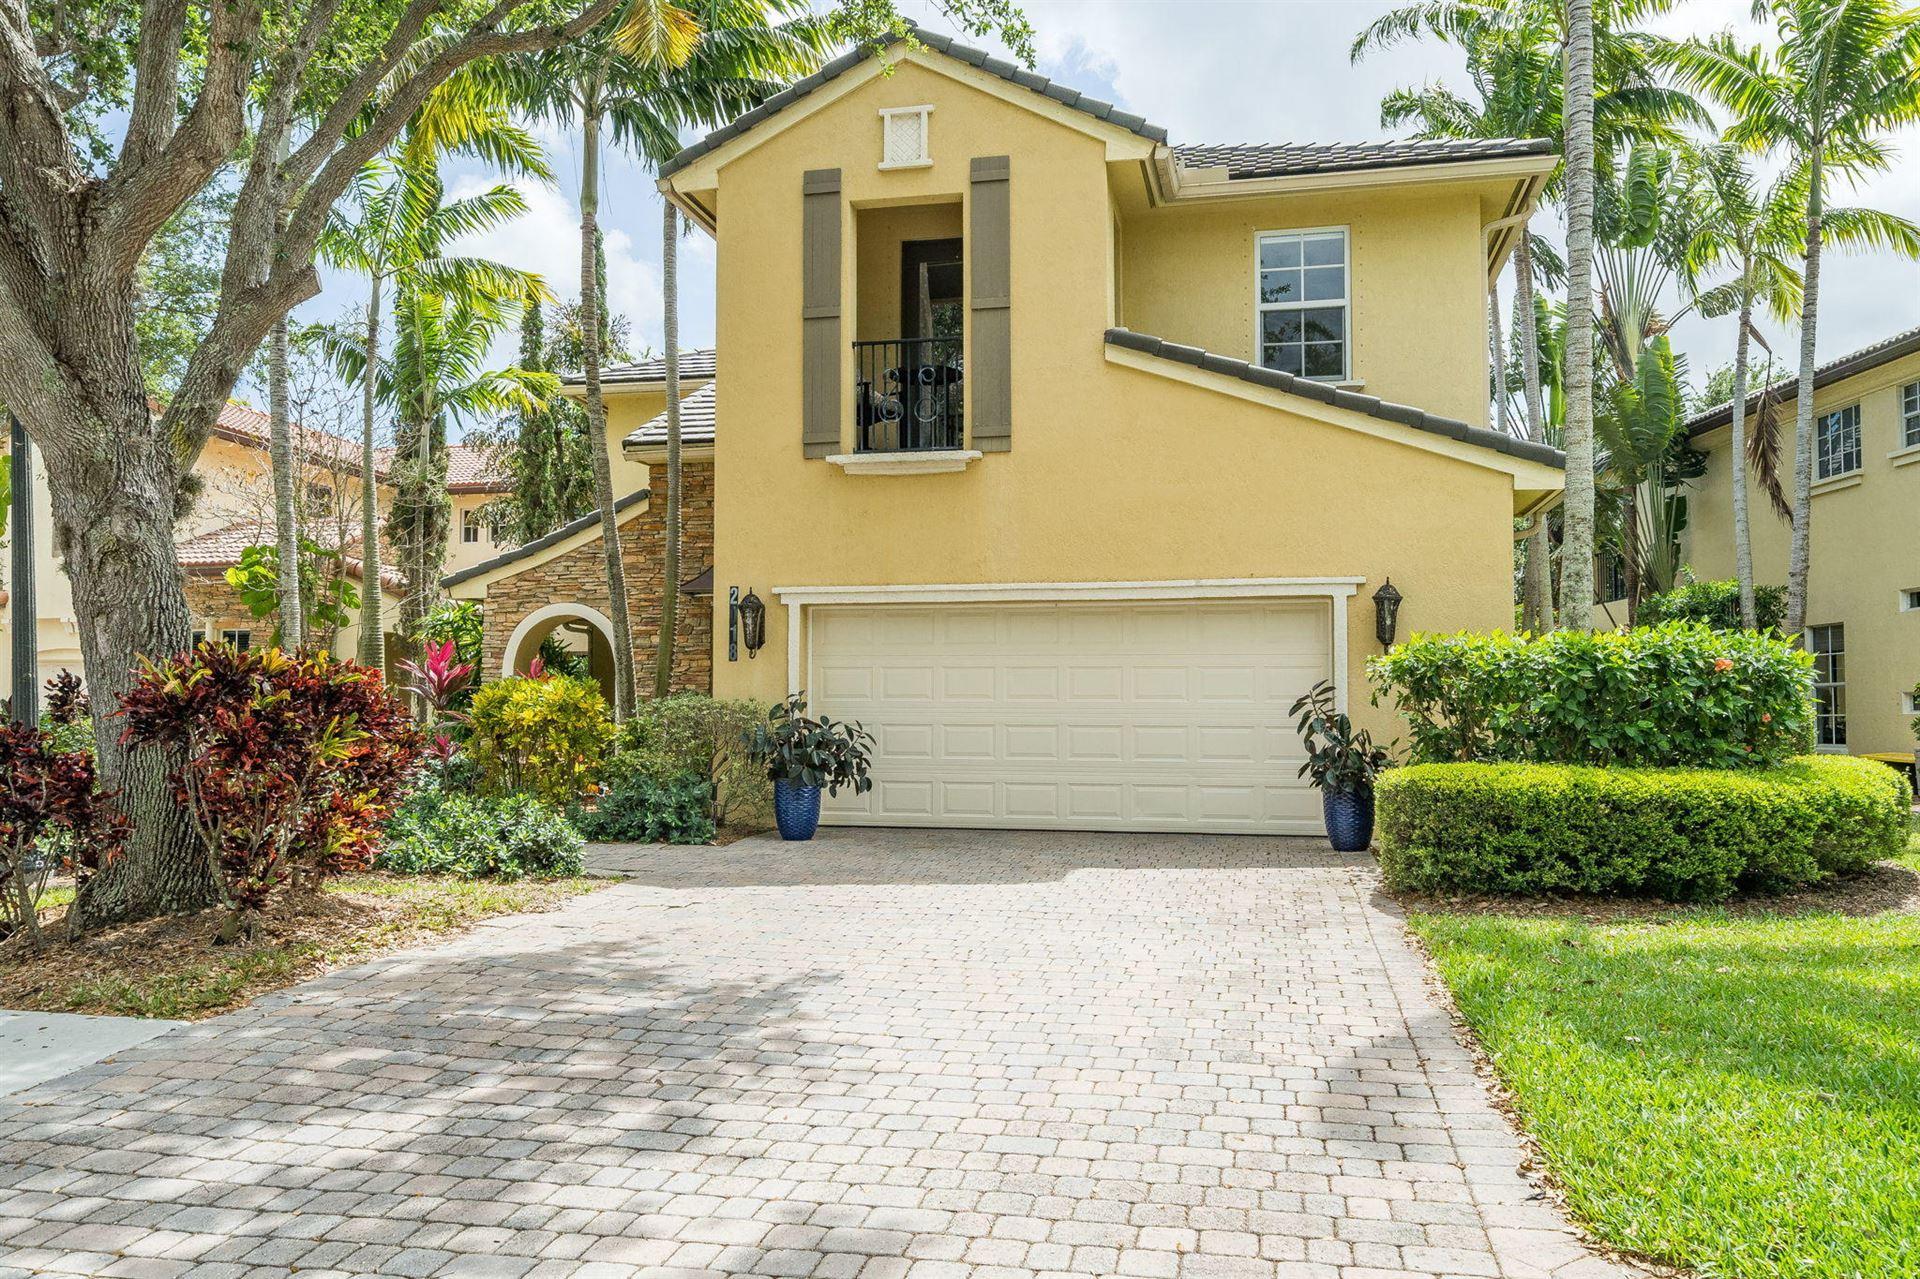 Photo of 2018 Graden Drive, Palm Beach Gardens, FL 33410 (MLS # RX-10704572)